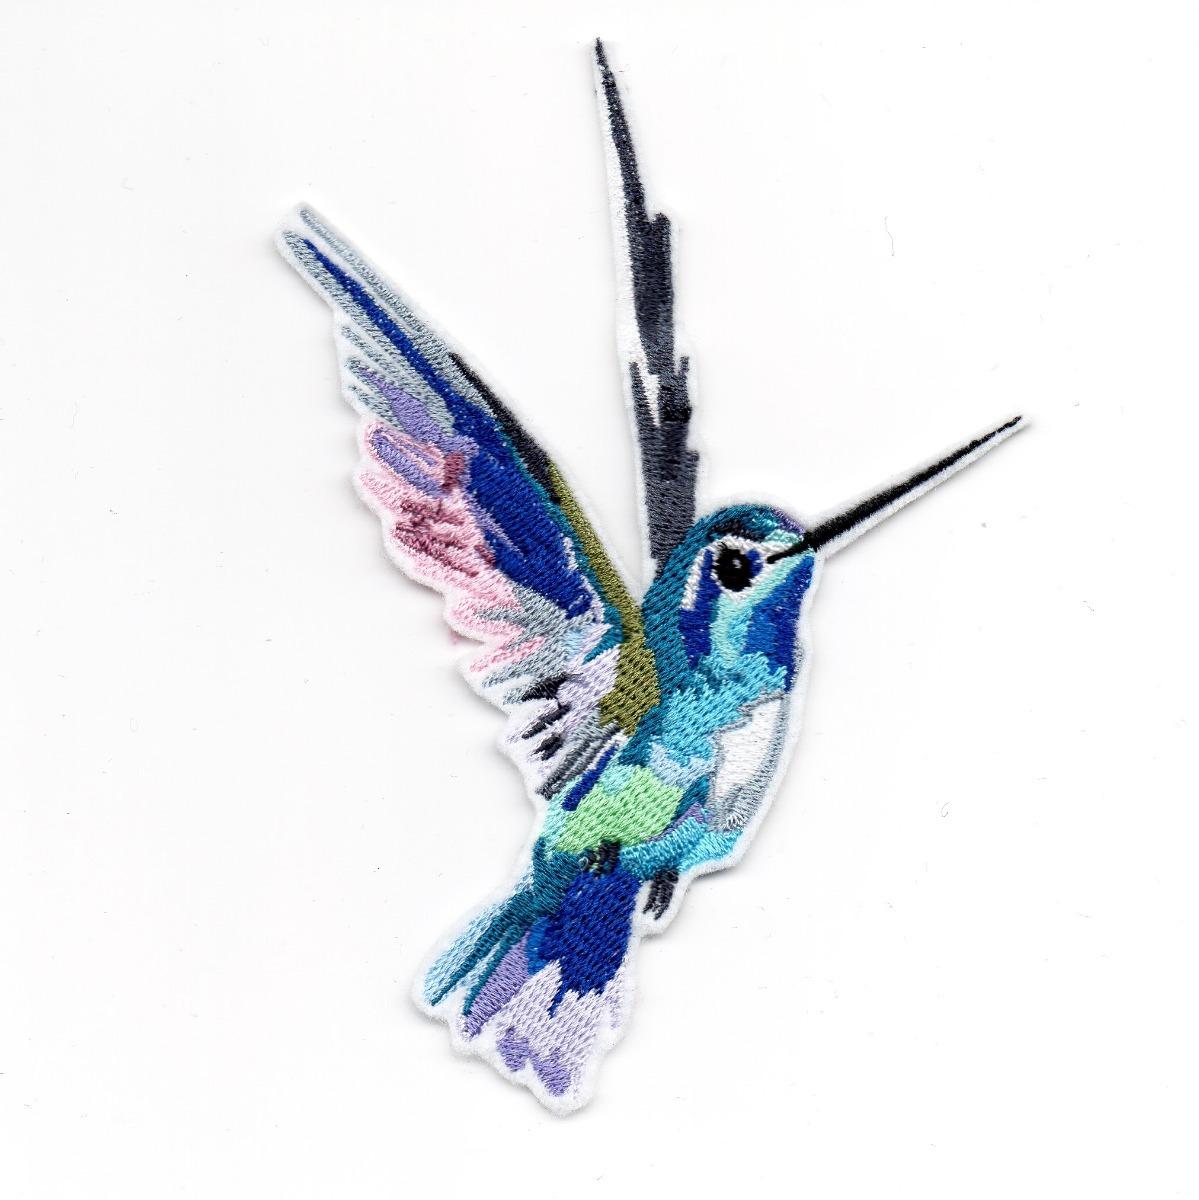 Parche Bordado Colibri Aves Pop Art Adherible - $ 80.00 en Mercado Libre